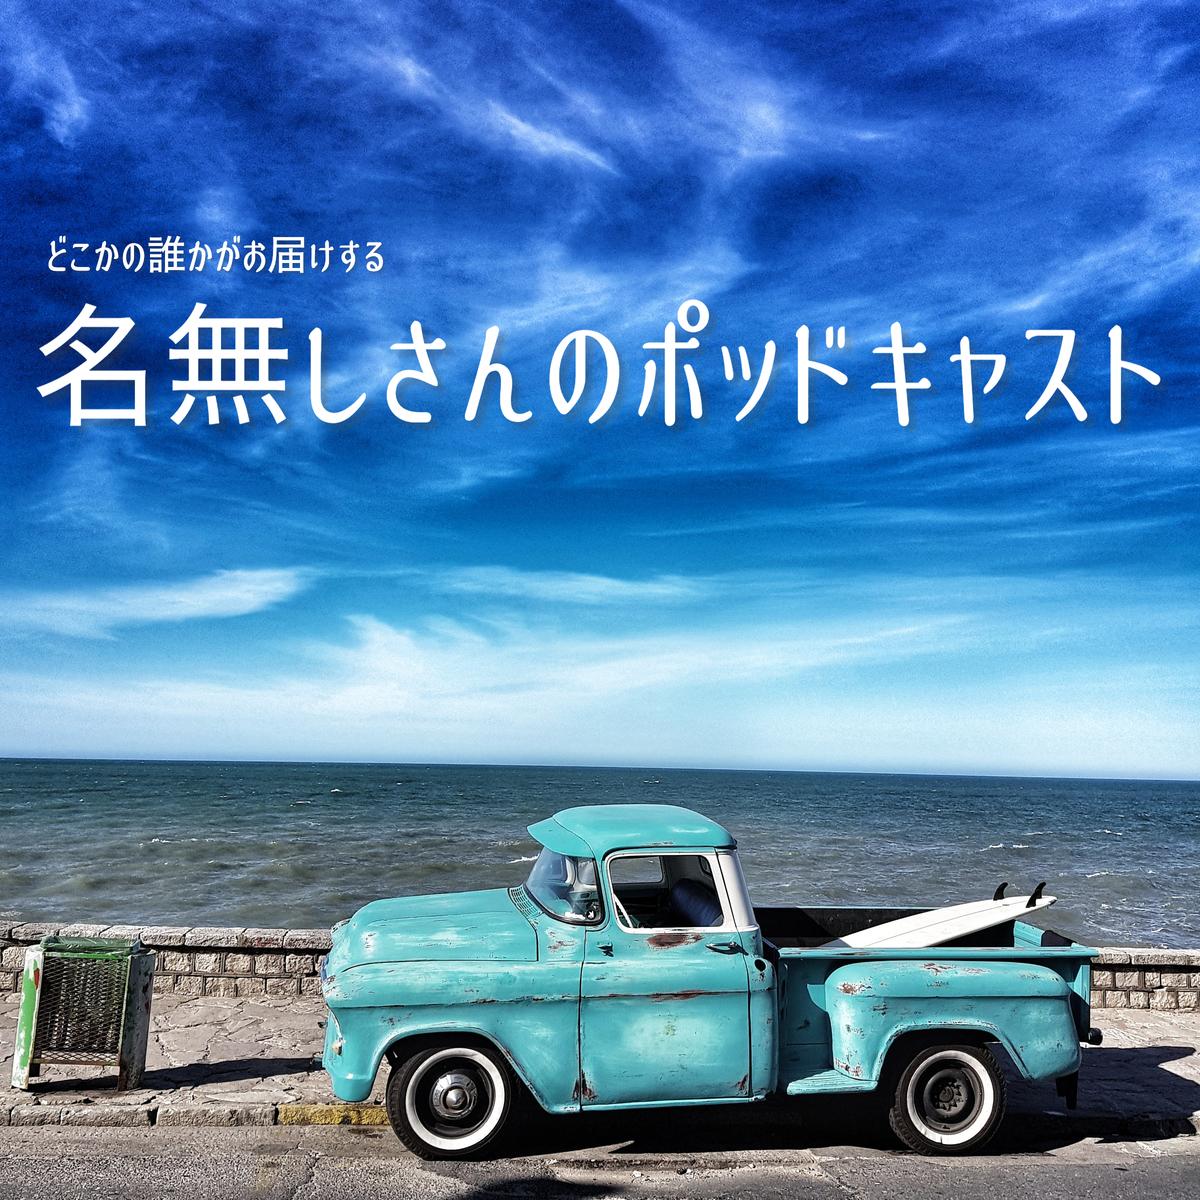 f:id:Keisuke69:20200625161245j:plain